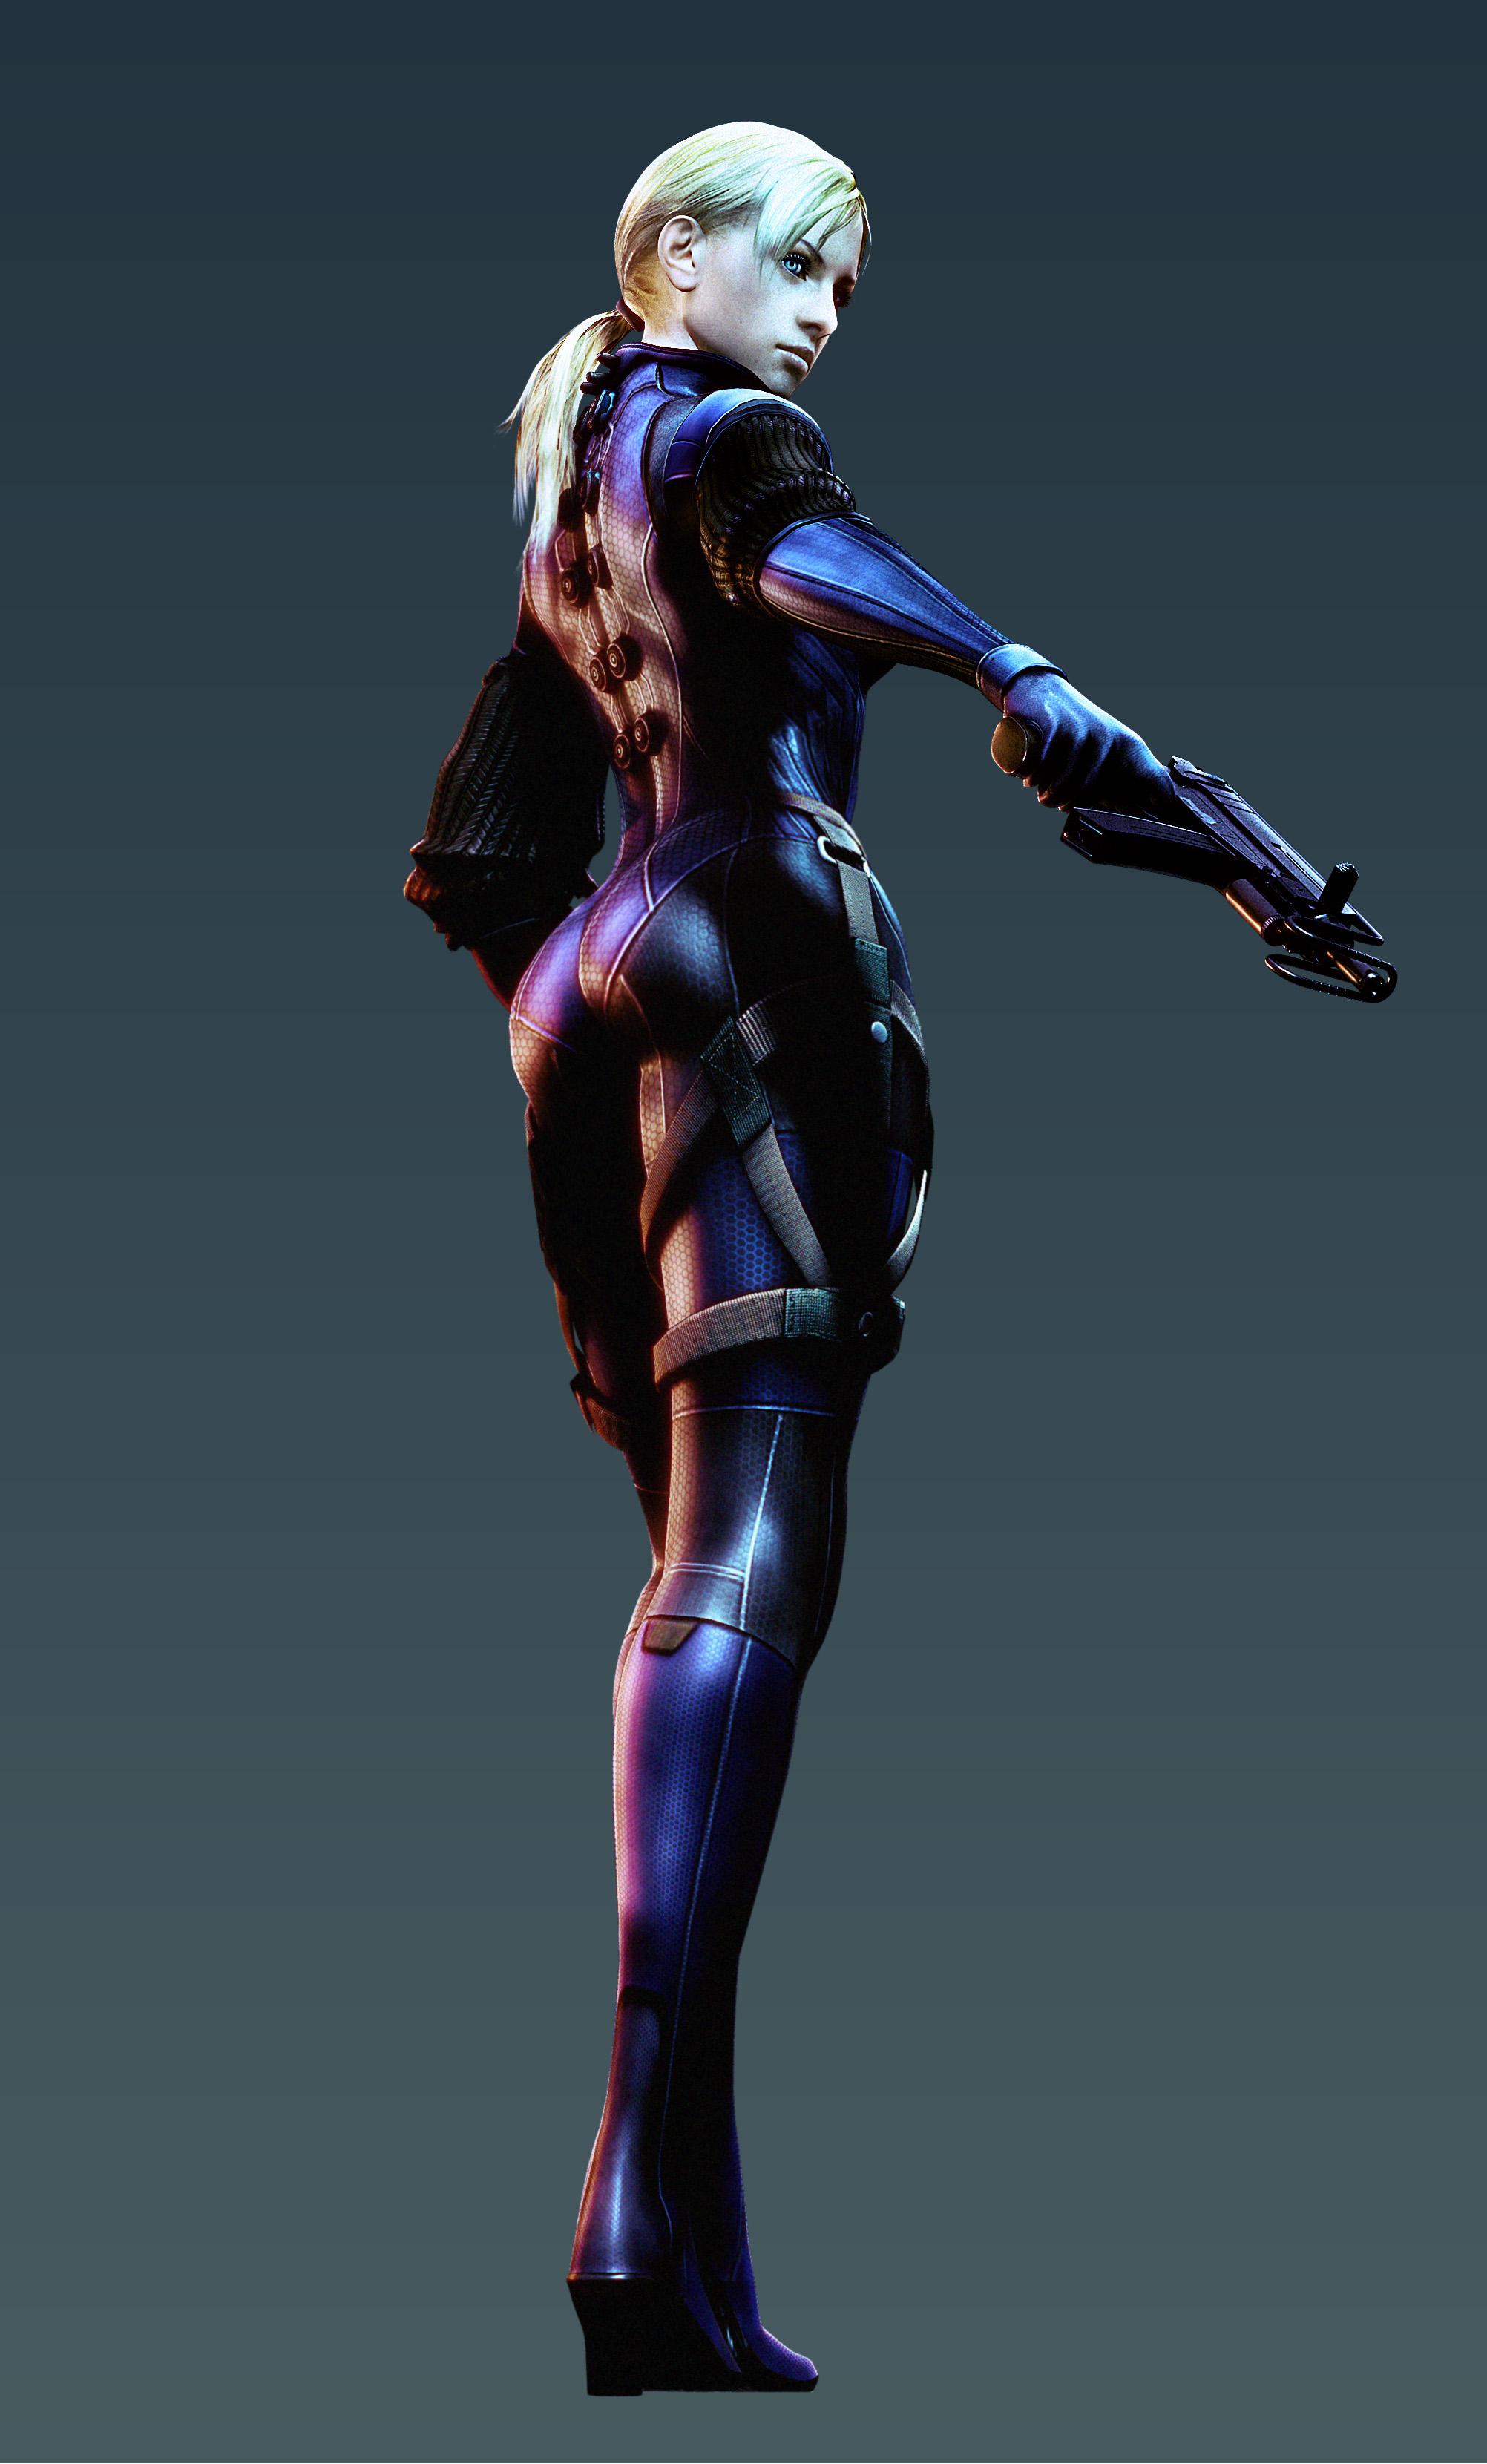 Resident Evil 5 Jill Valentine Re5 Battlesuit Minitokyo